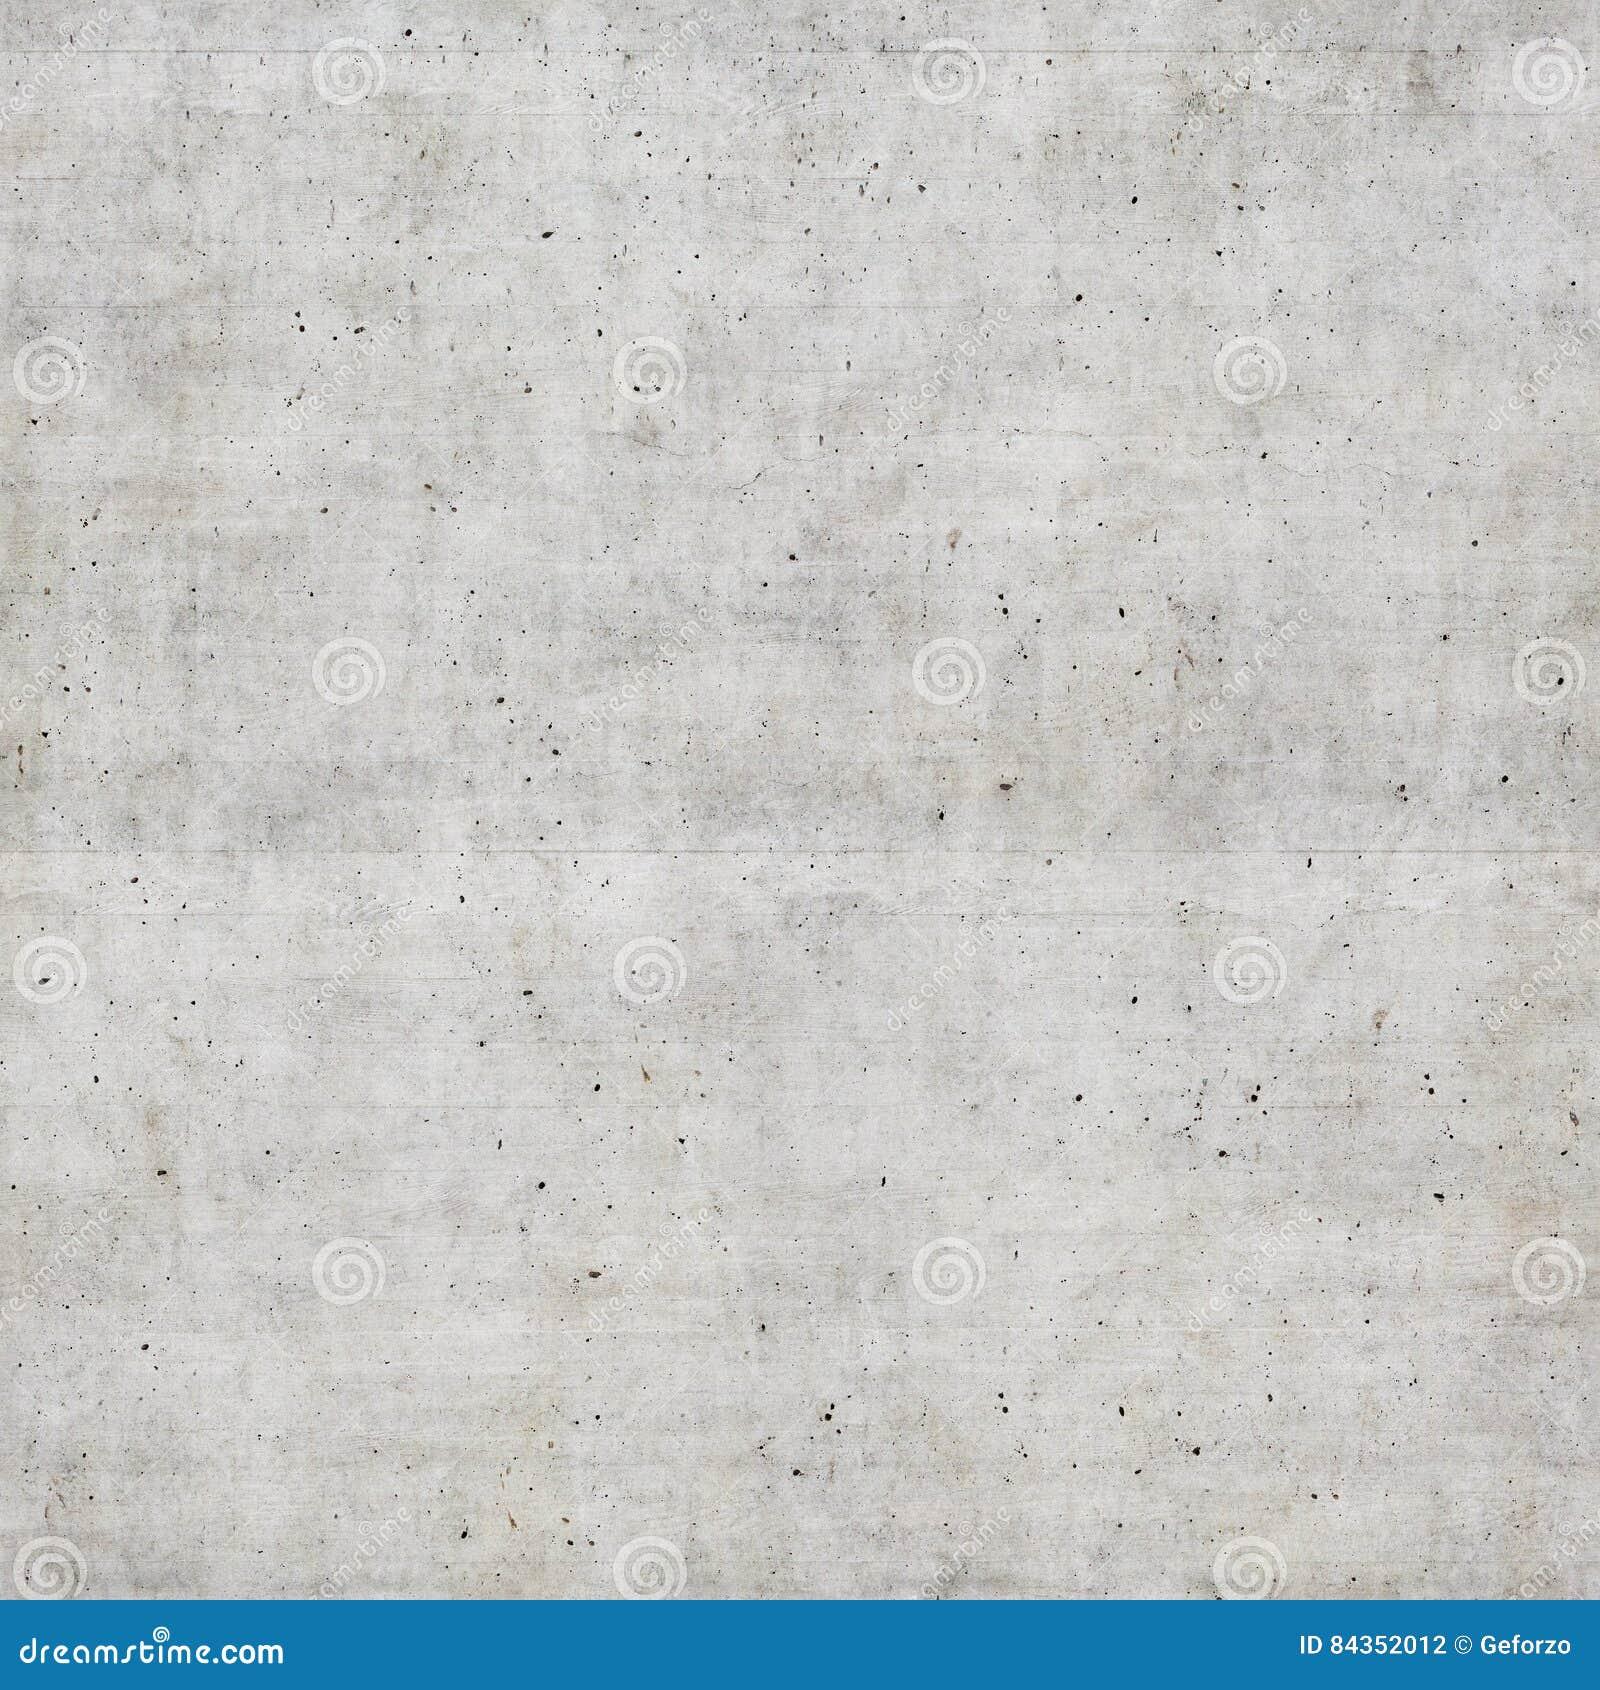 Hormigón gris del fondo de la textura inconsútil de la pared